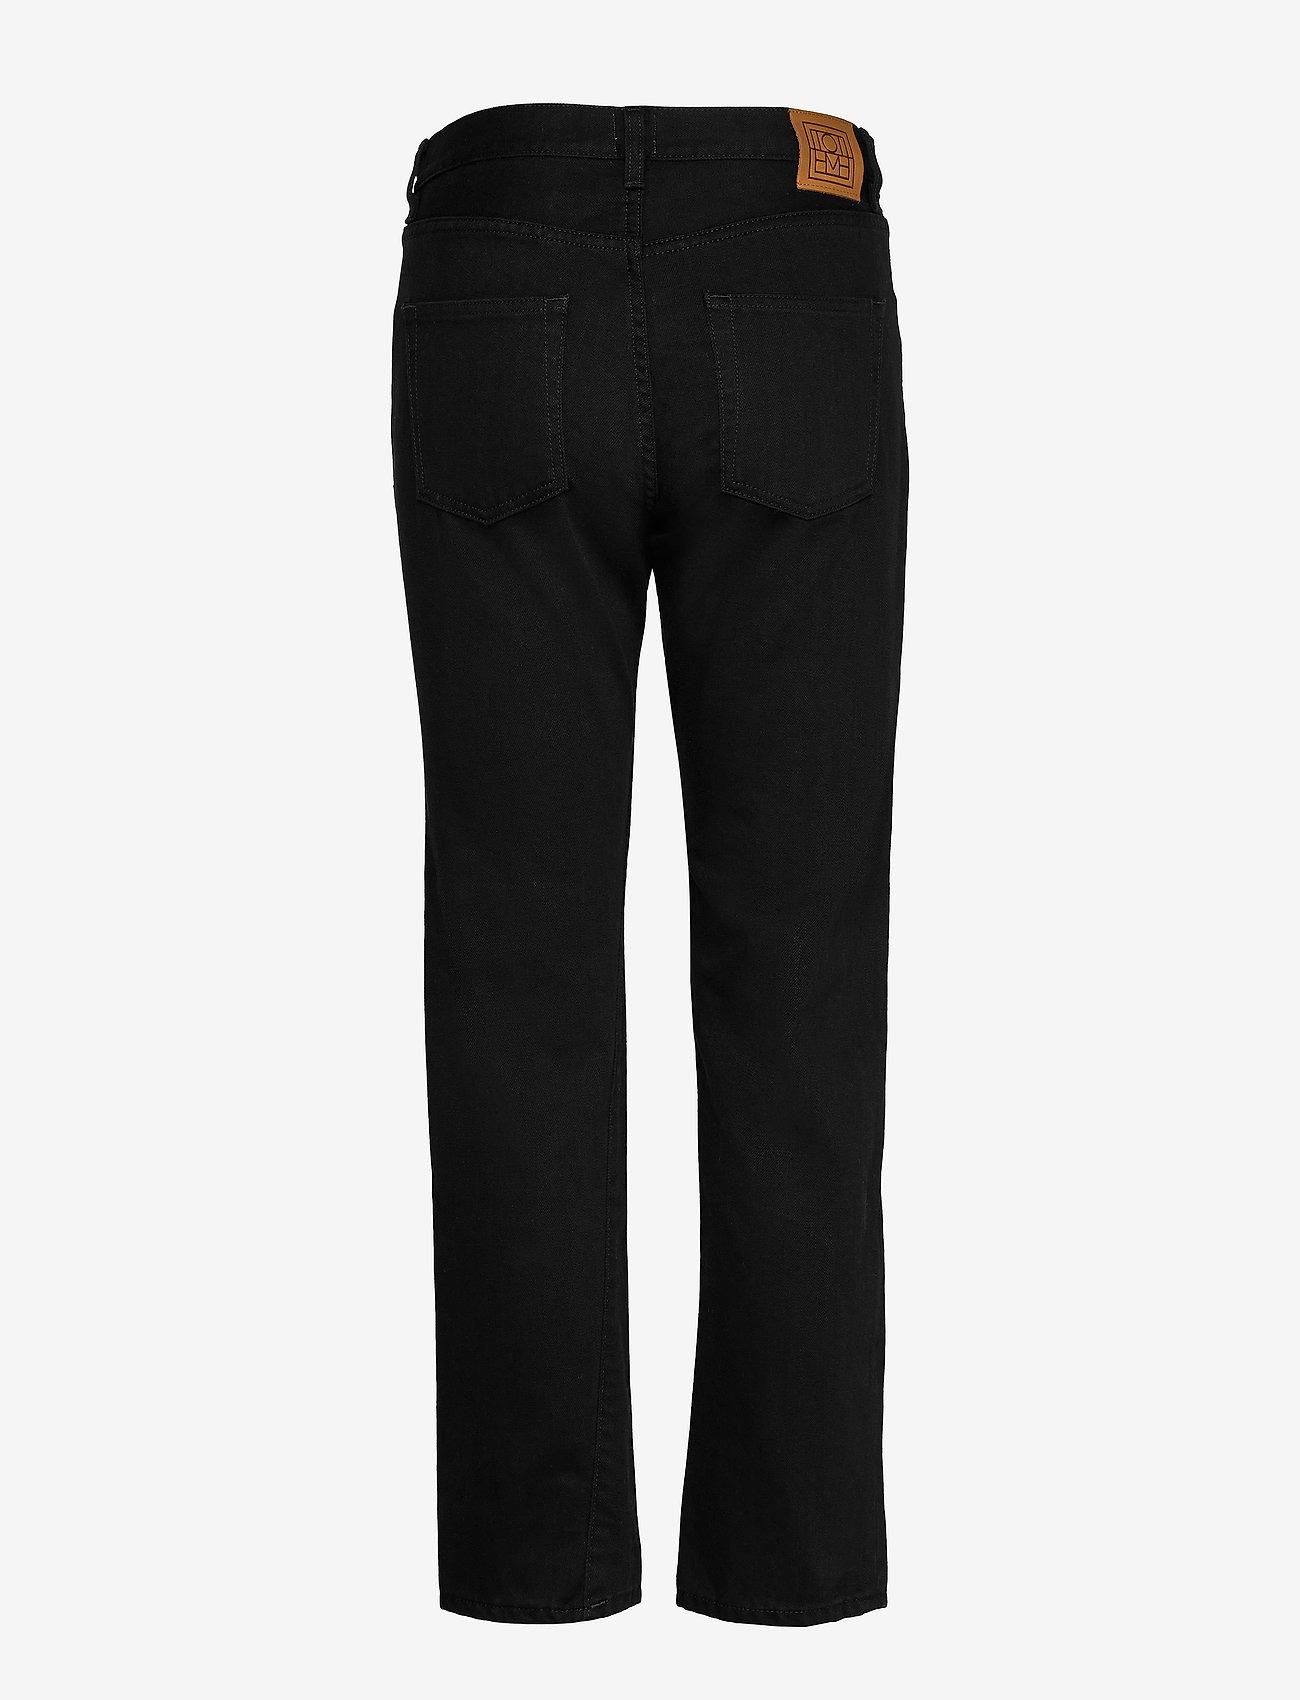 Totême - ORIGINAL DENIM - straight jeans - black rinse 290 - 1